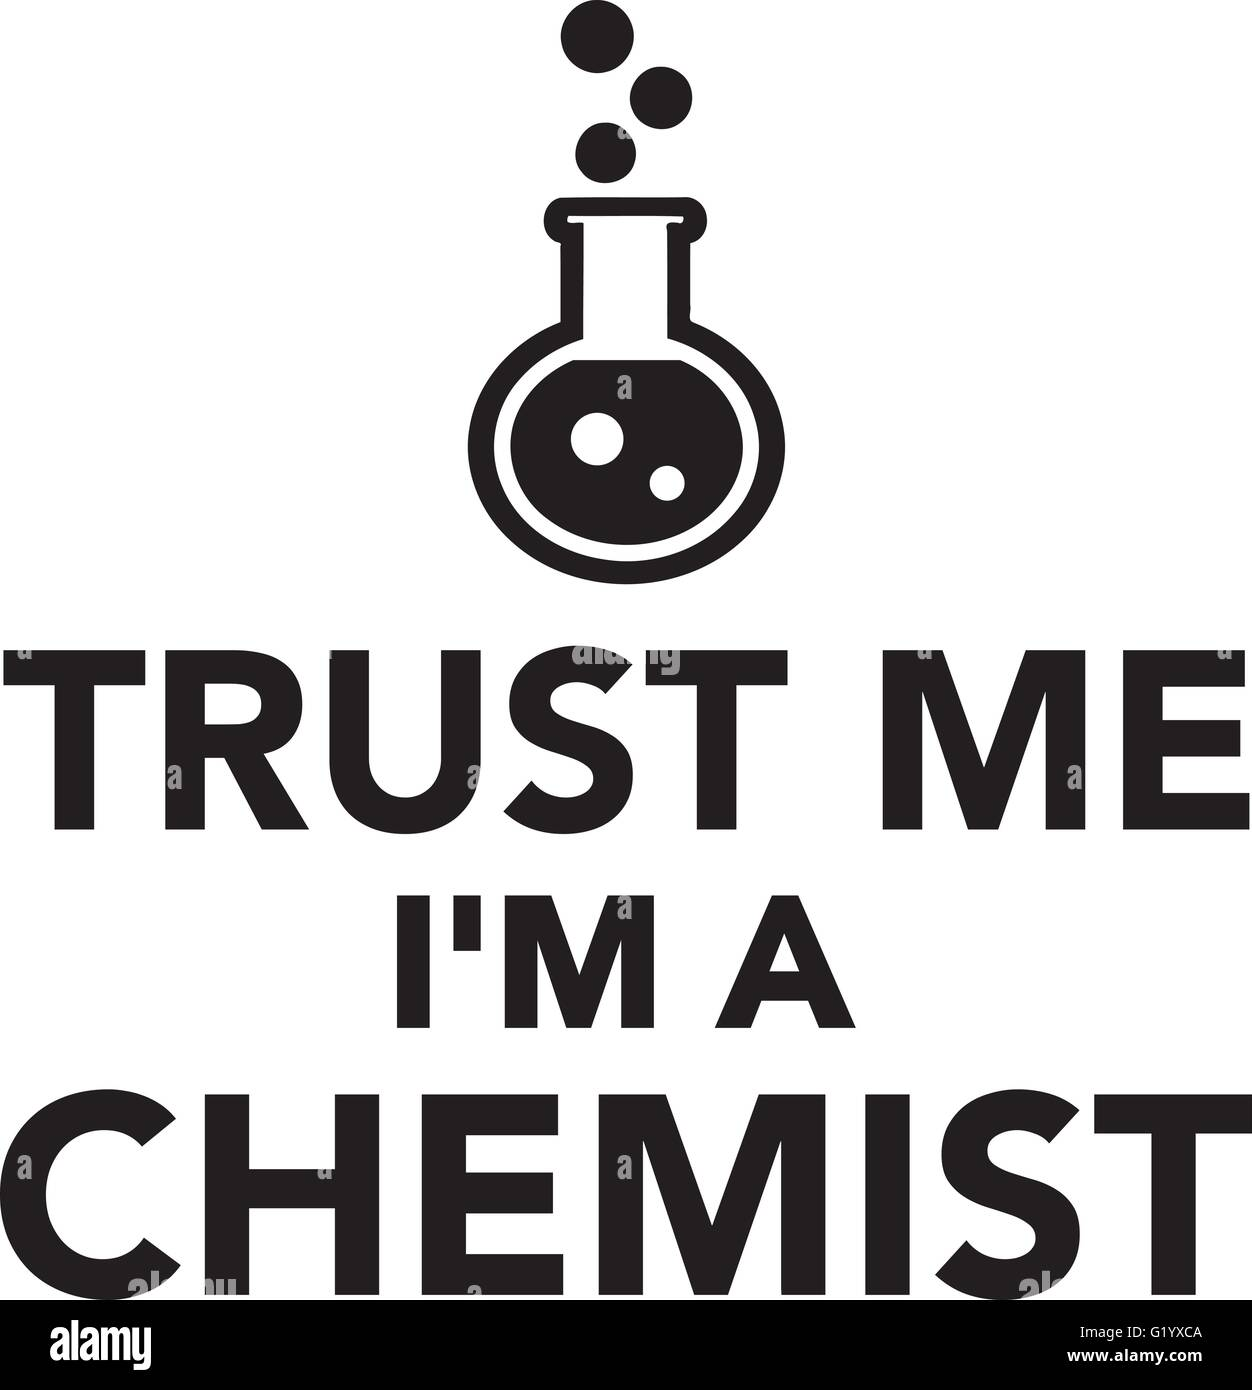 Trust me I'm a chemist - Stock Vector